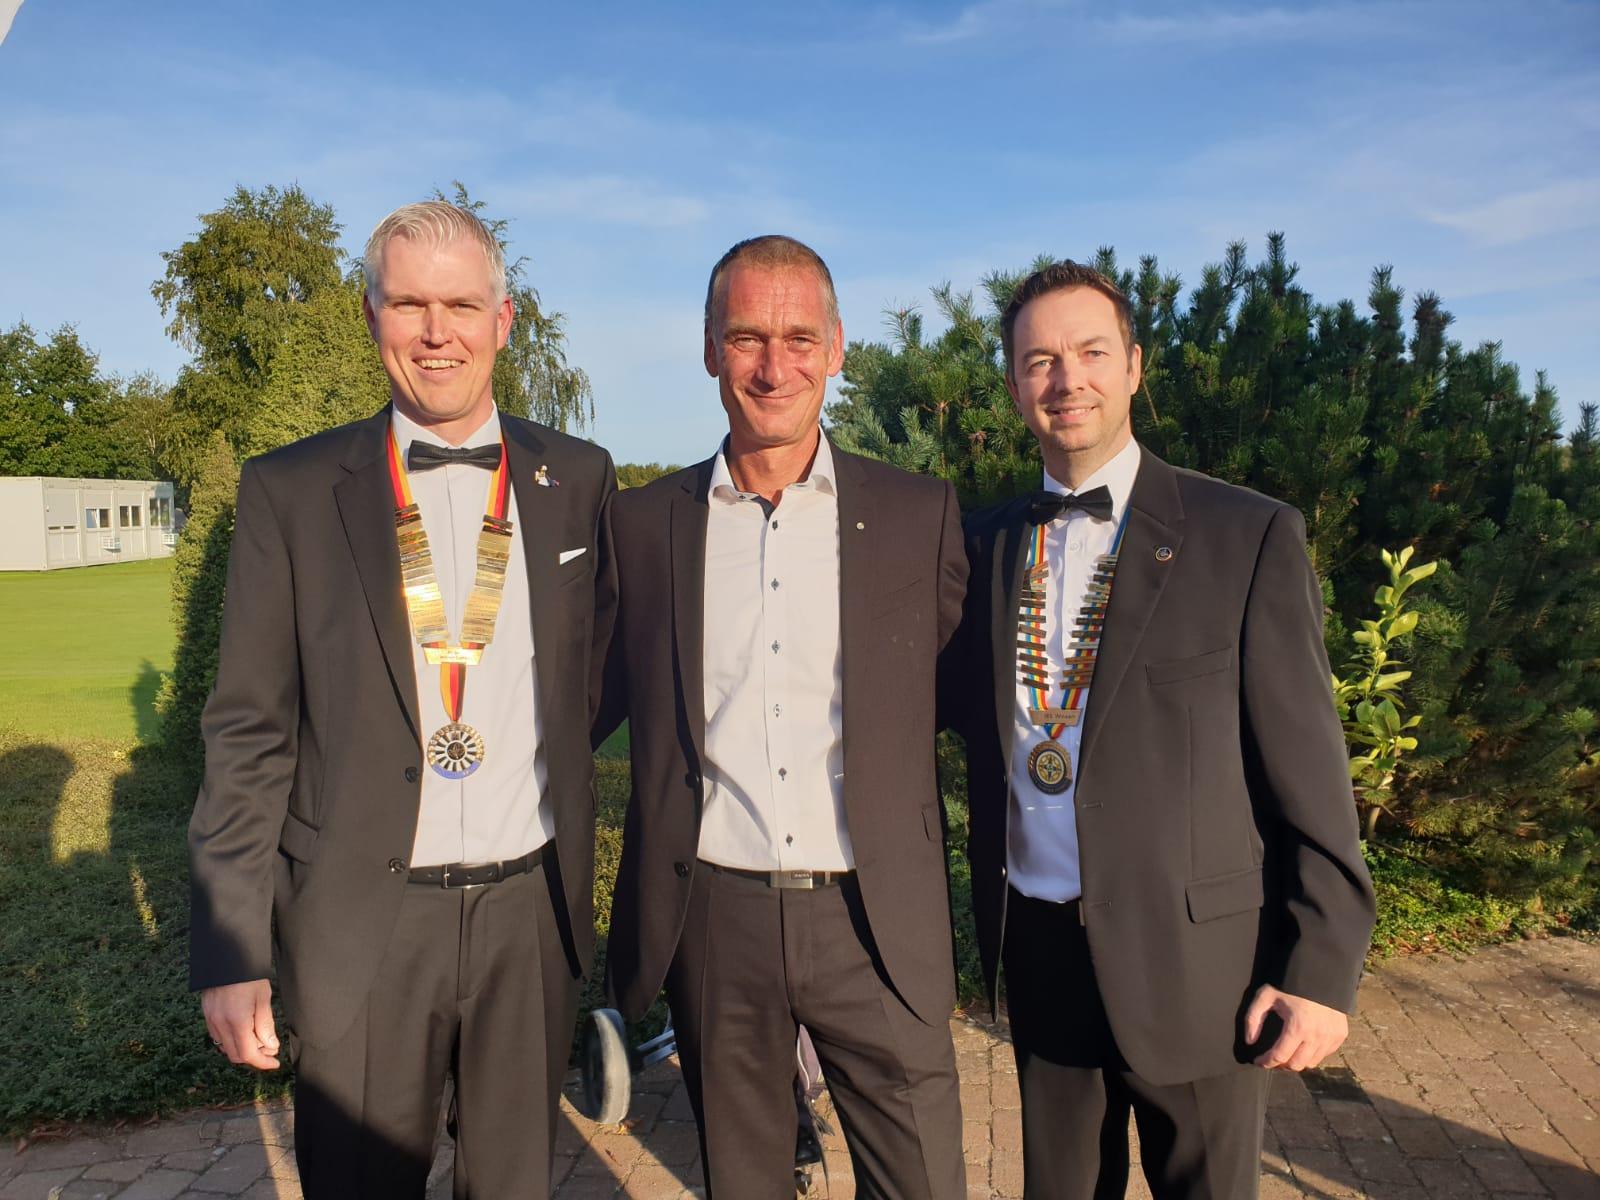 v.l. Oliver Stein (amtierender RT Präsident) Arne Sellmer (Chef Organisator), Marco Stelle (Präsident des OT)